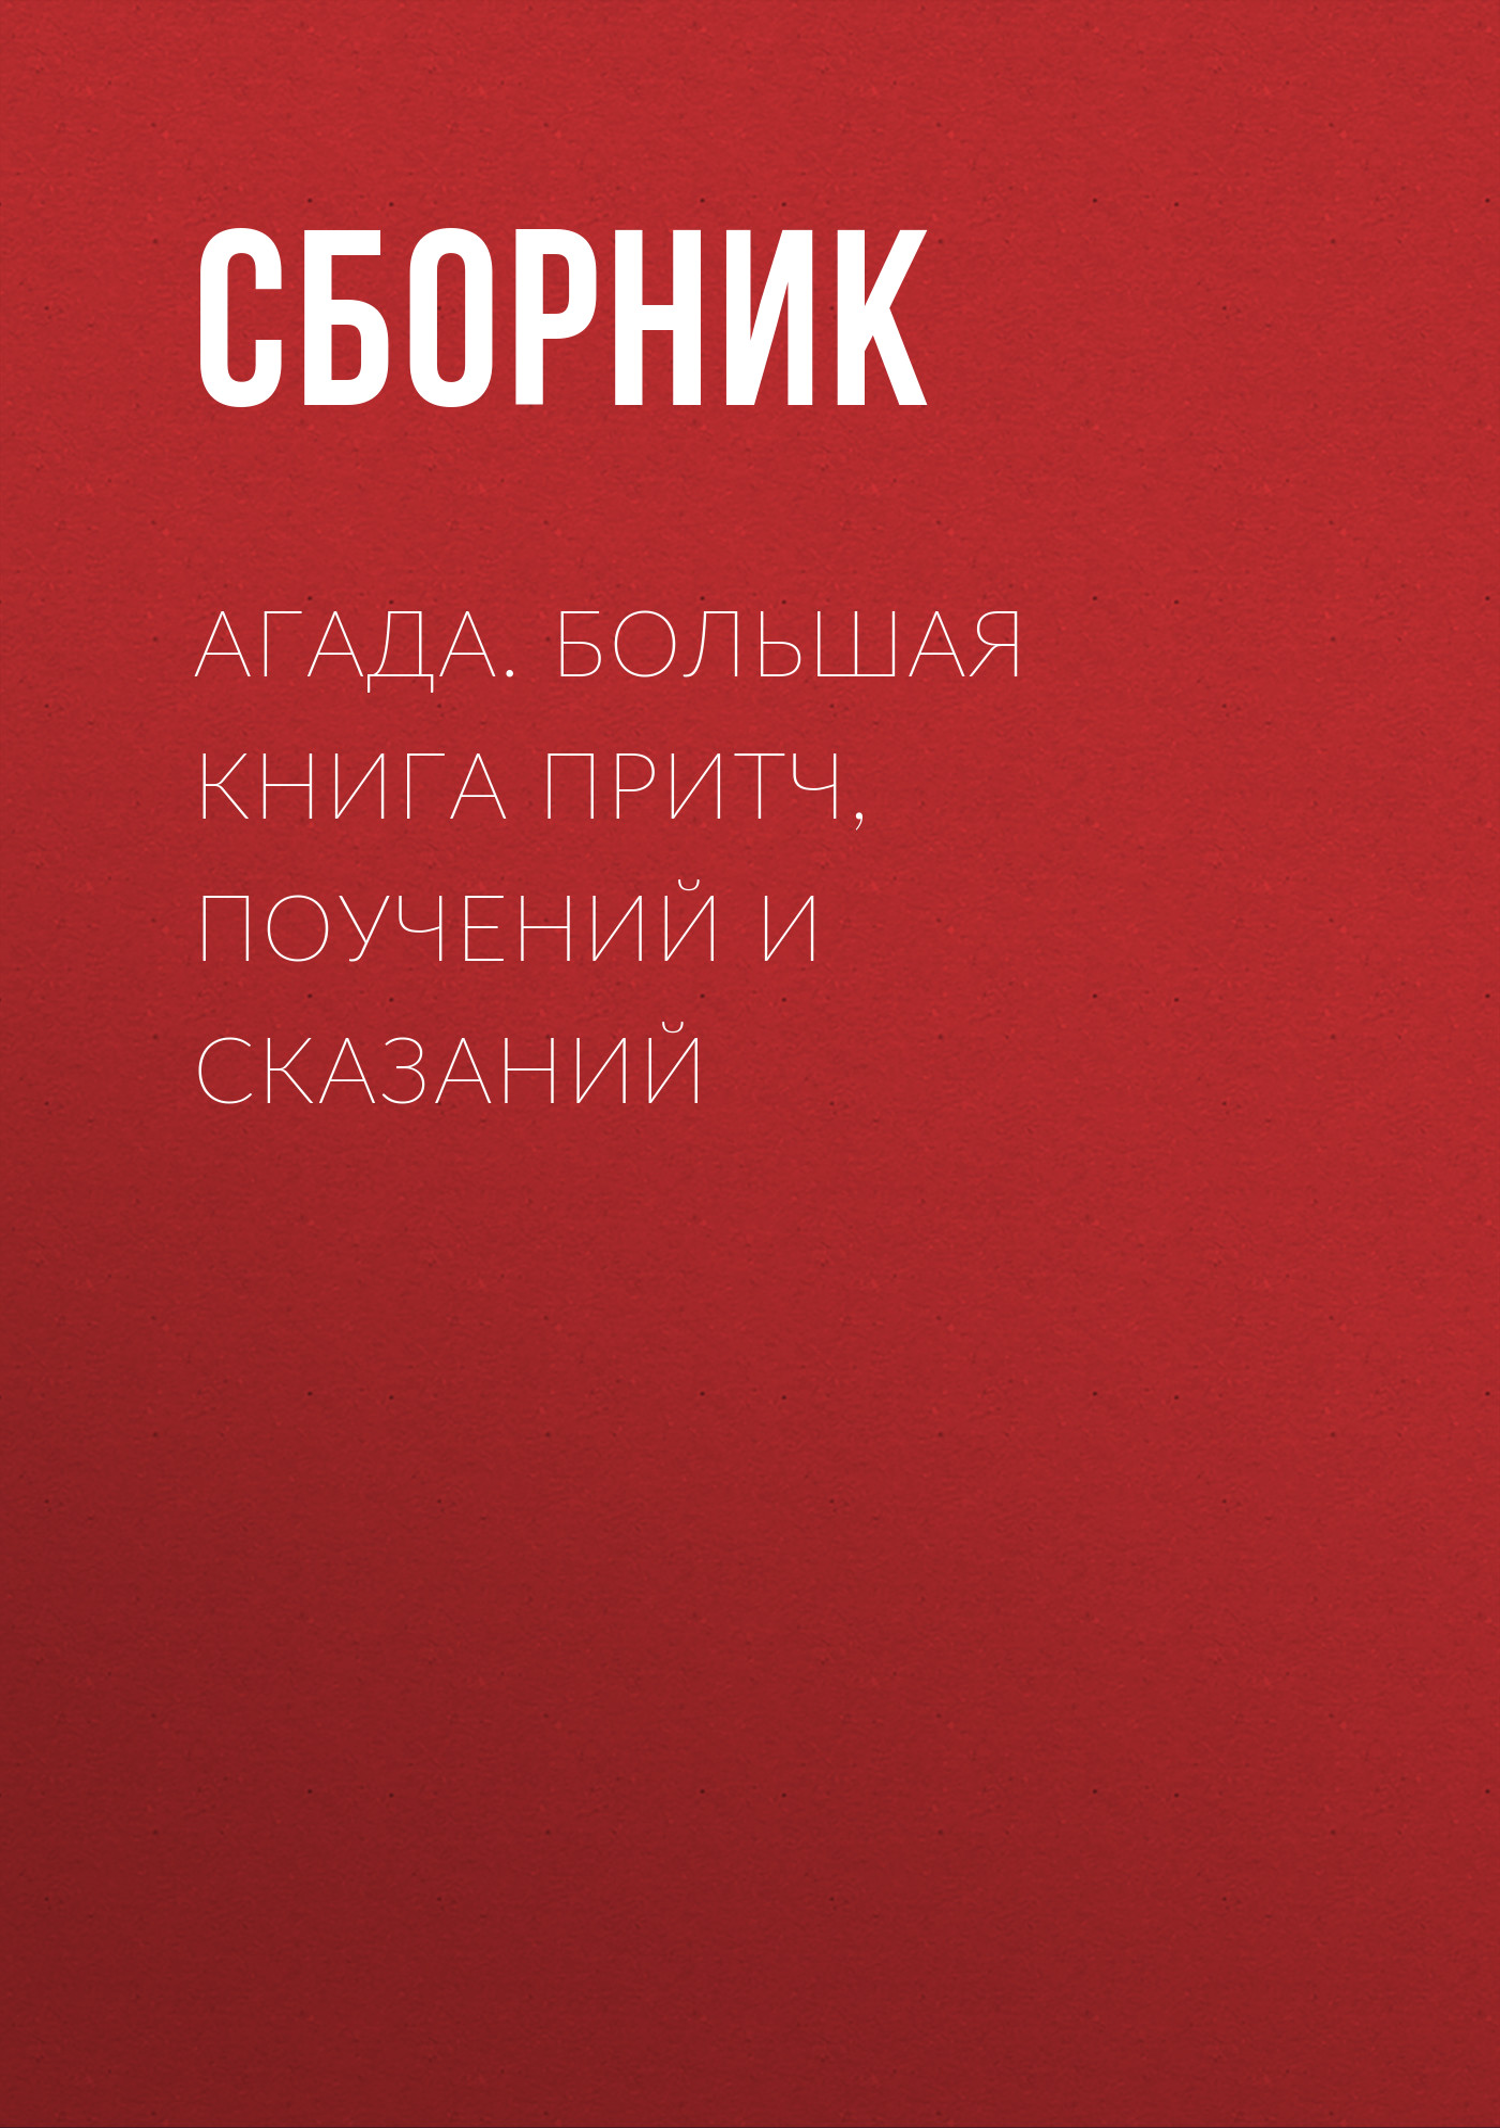 Сборник Агада. Большая книга притч, поучений и сказаний v prilozheniyah dlya android android obnaruzhili page 8